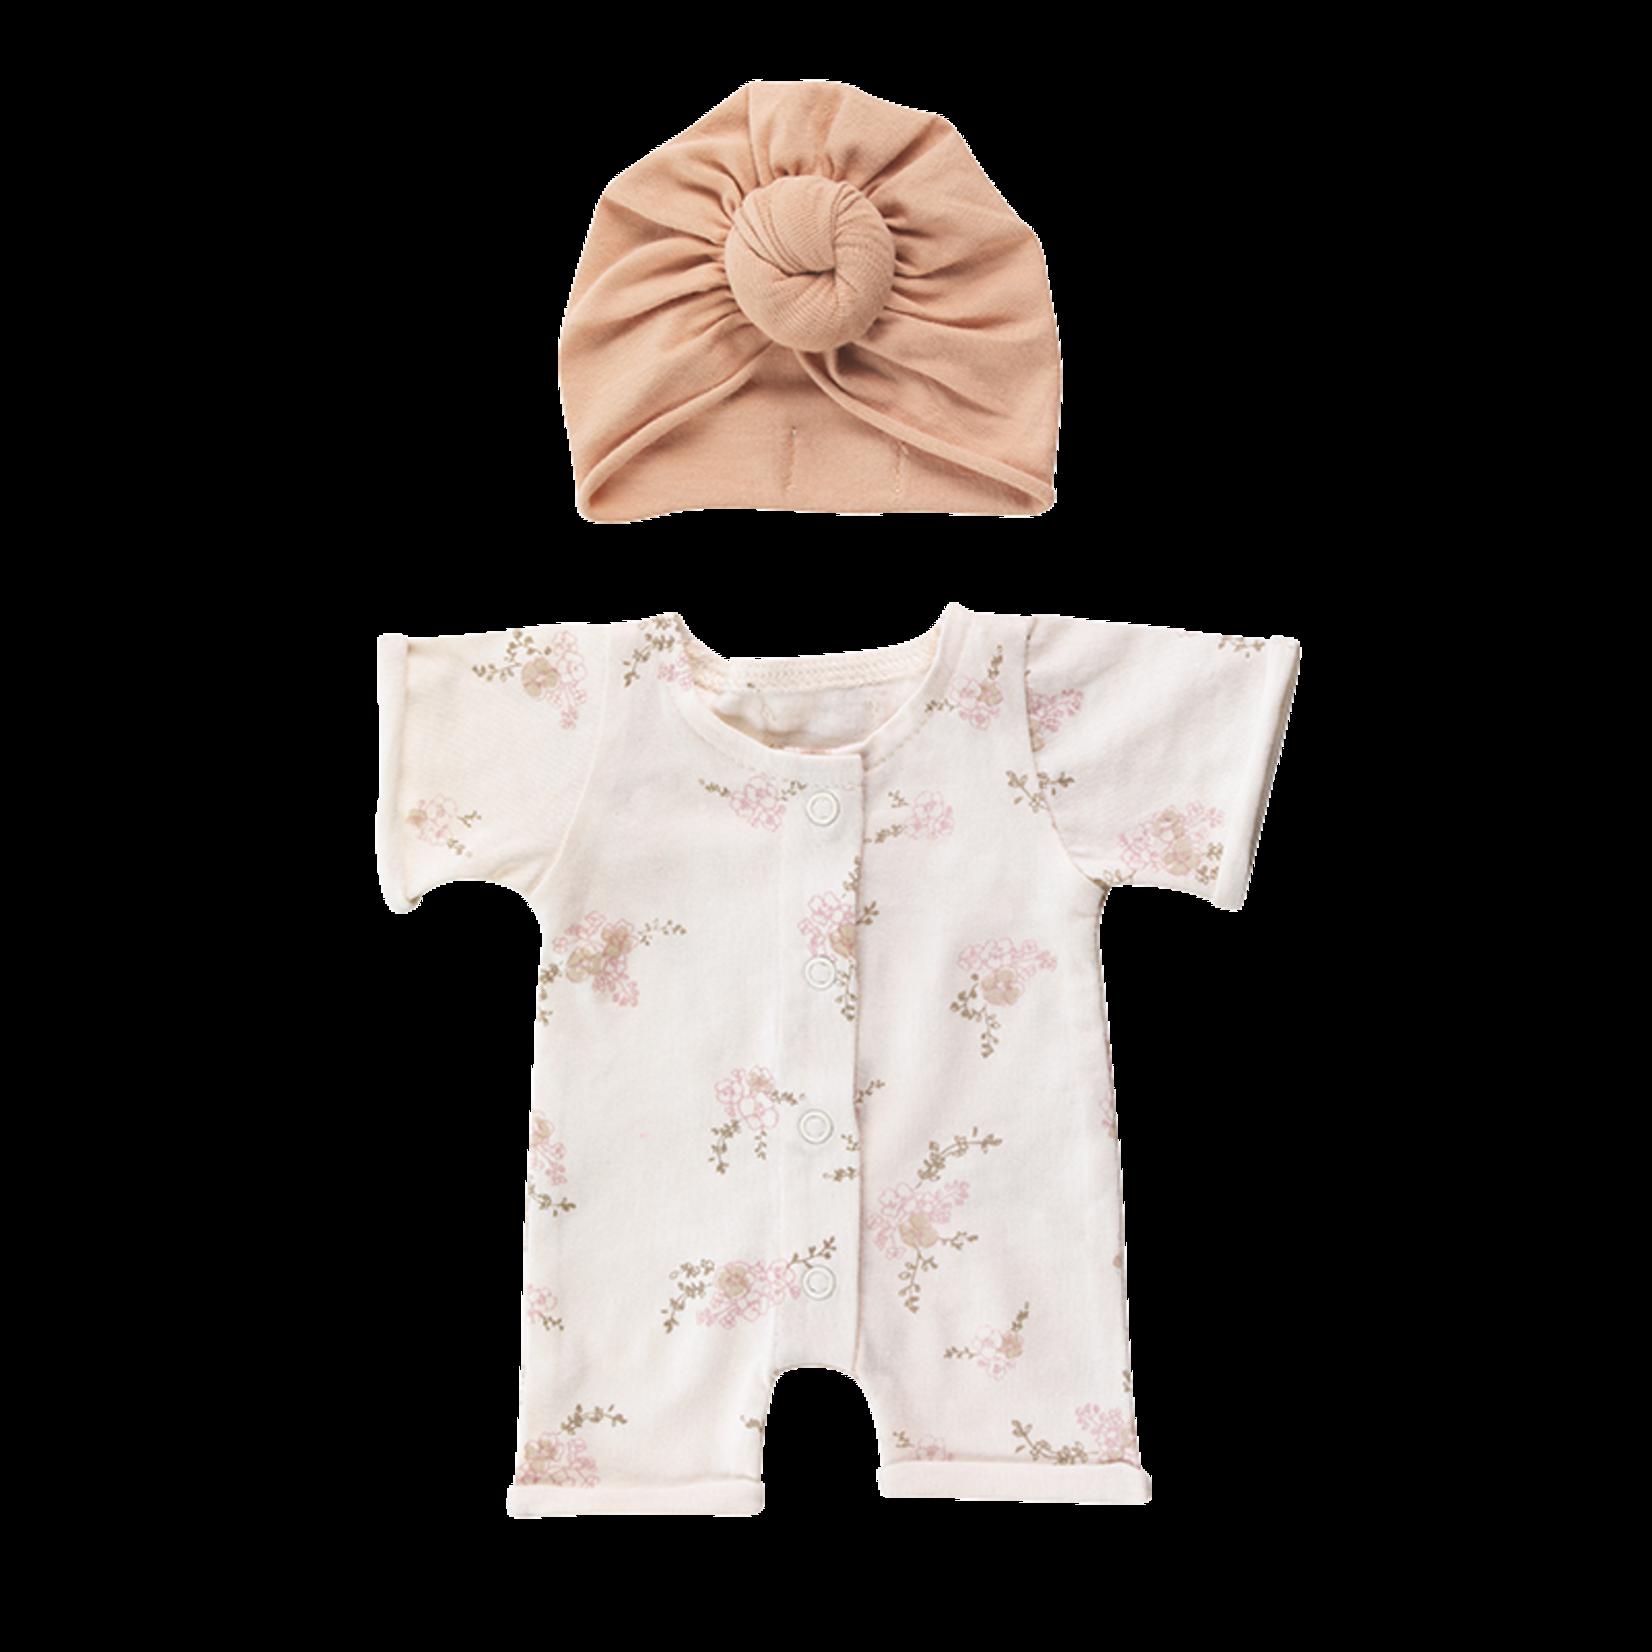 Bonjour Little Bonjour Little Doll outfit Pansies/Nude